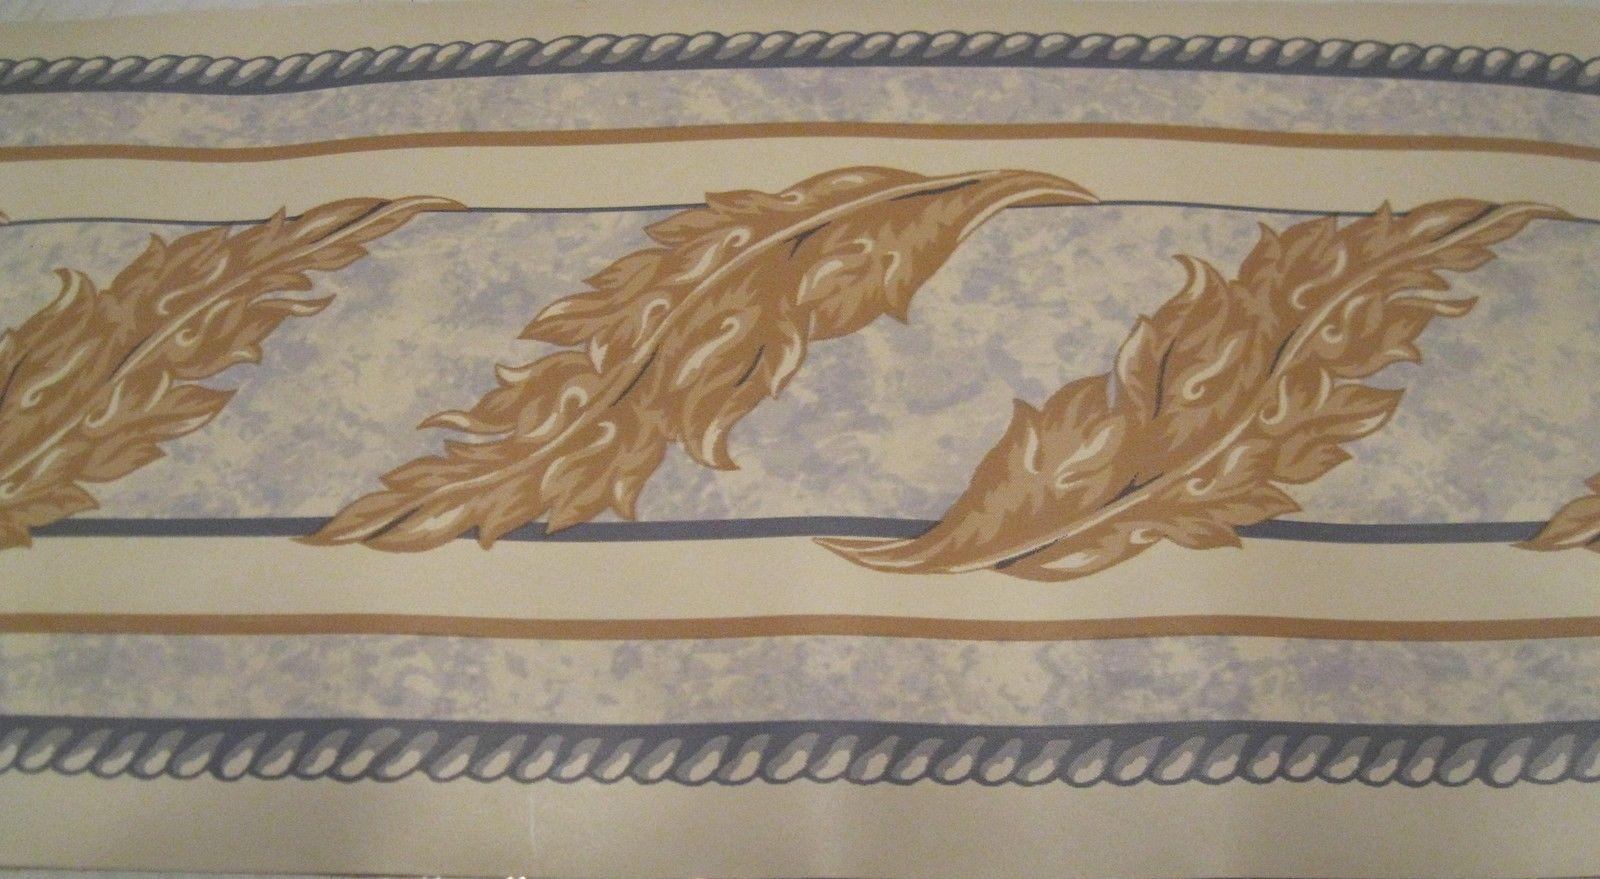 Blue Rope Gold Acanthus Leaf Swirl Scroll White Wallpaper Border 1600x879